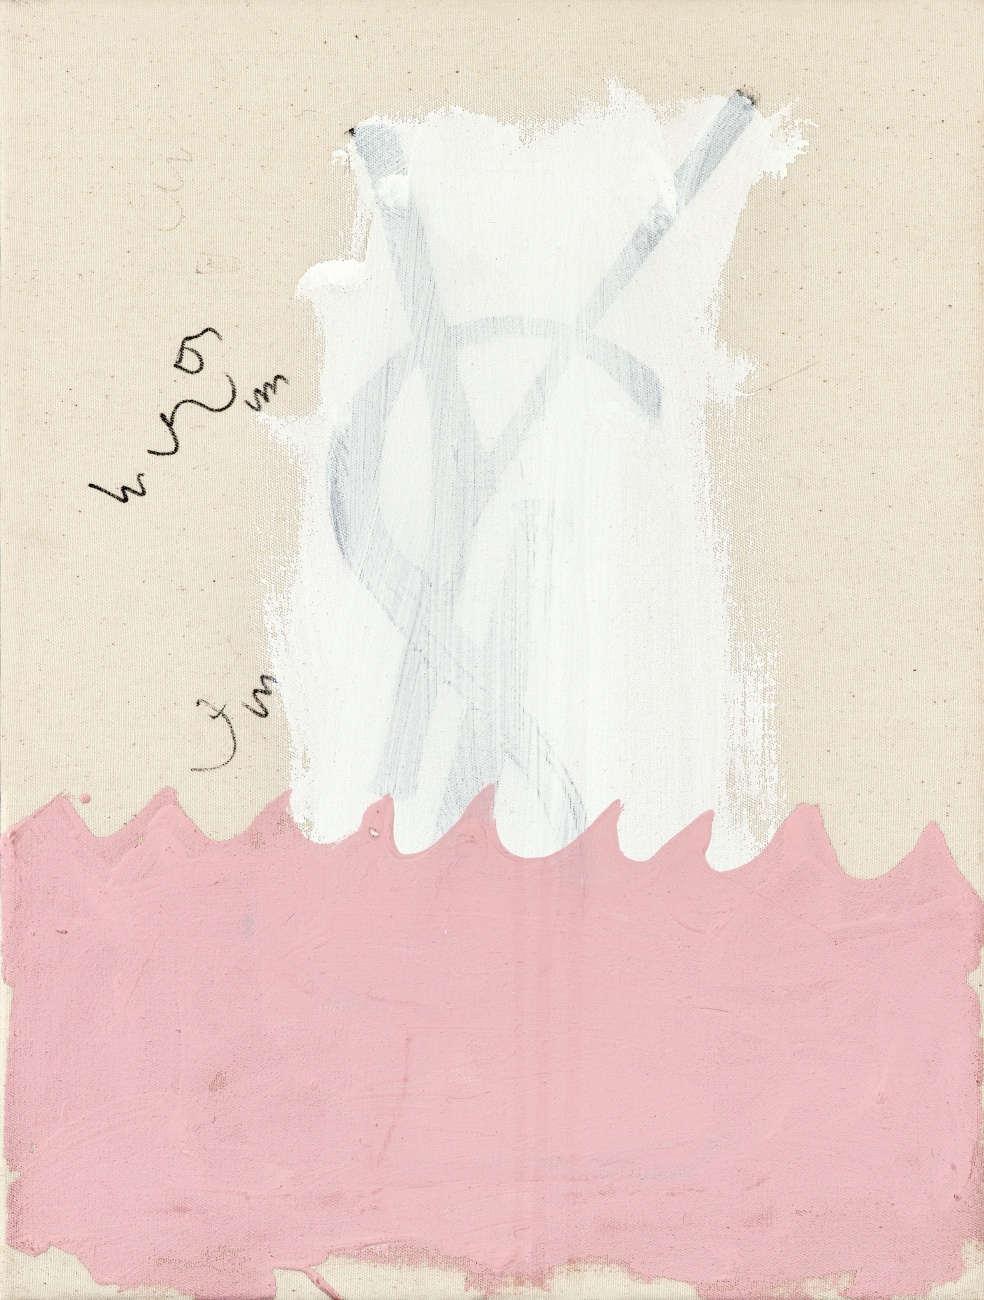 David Ostrowski-YSL-2006